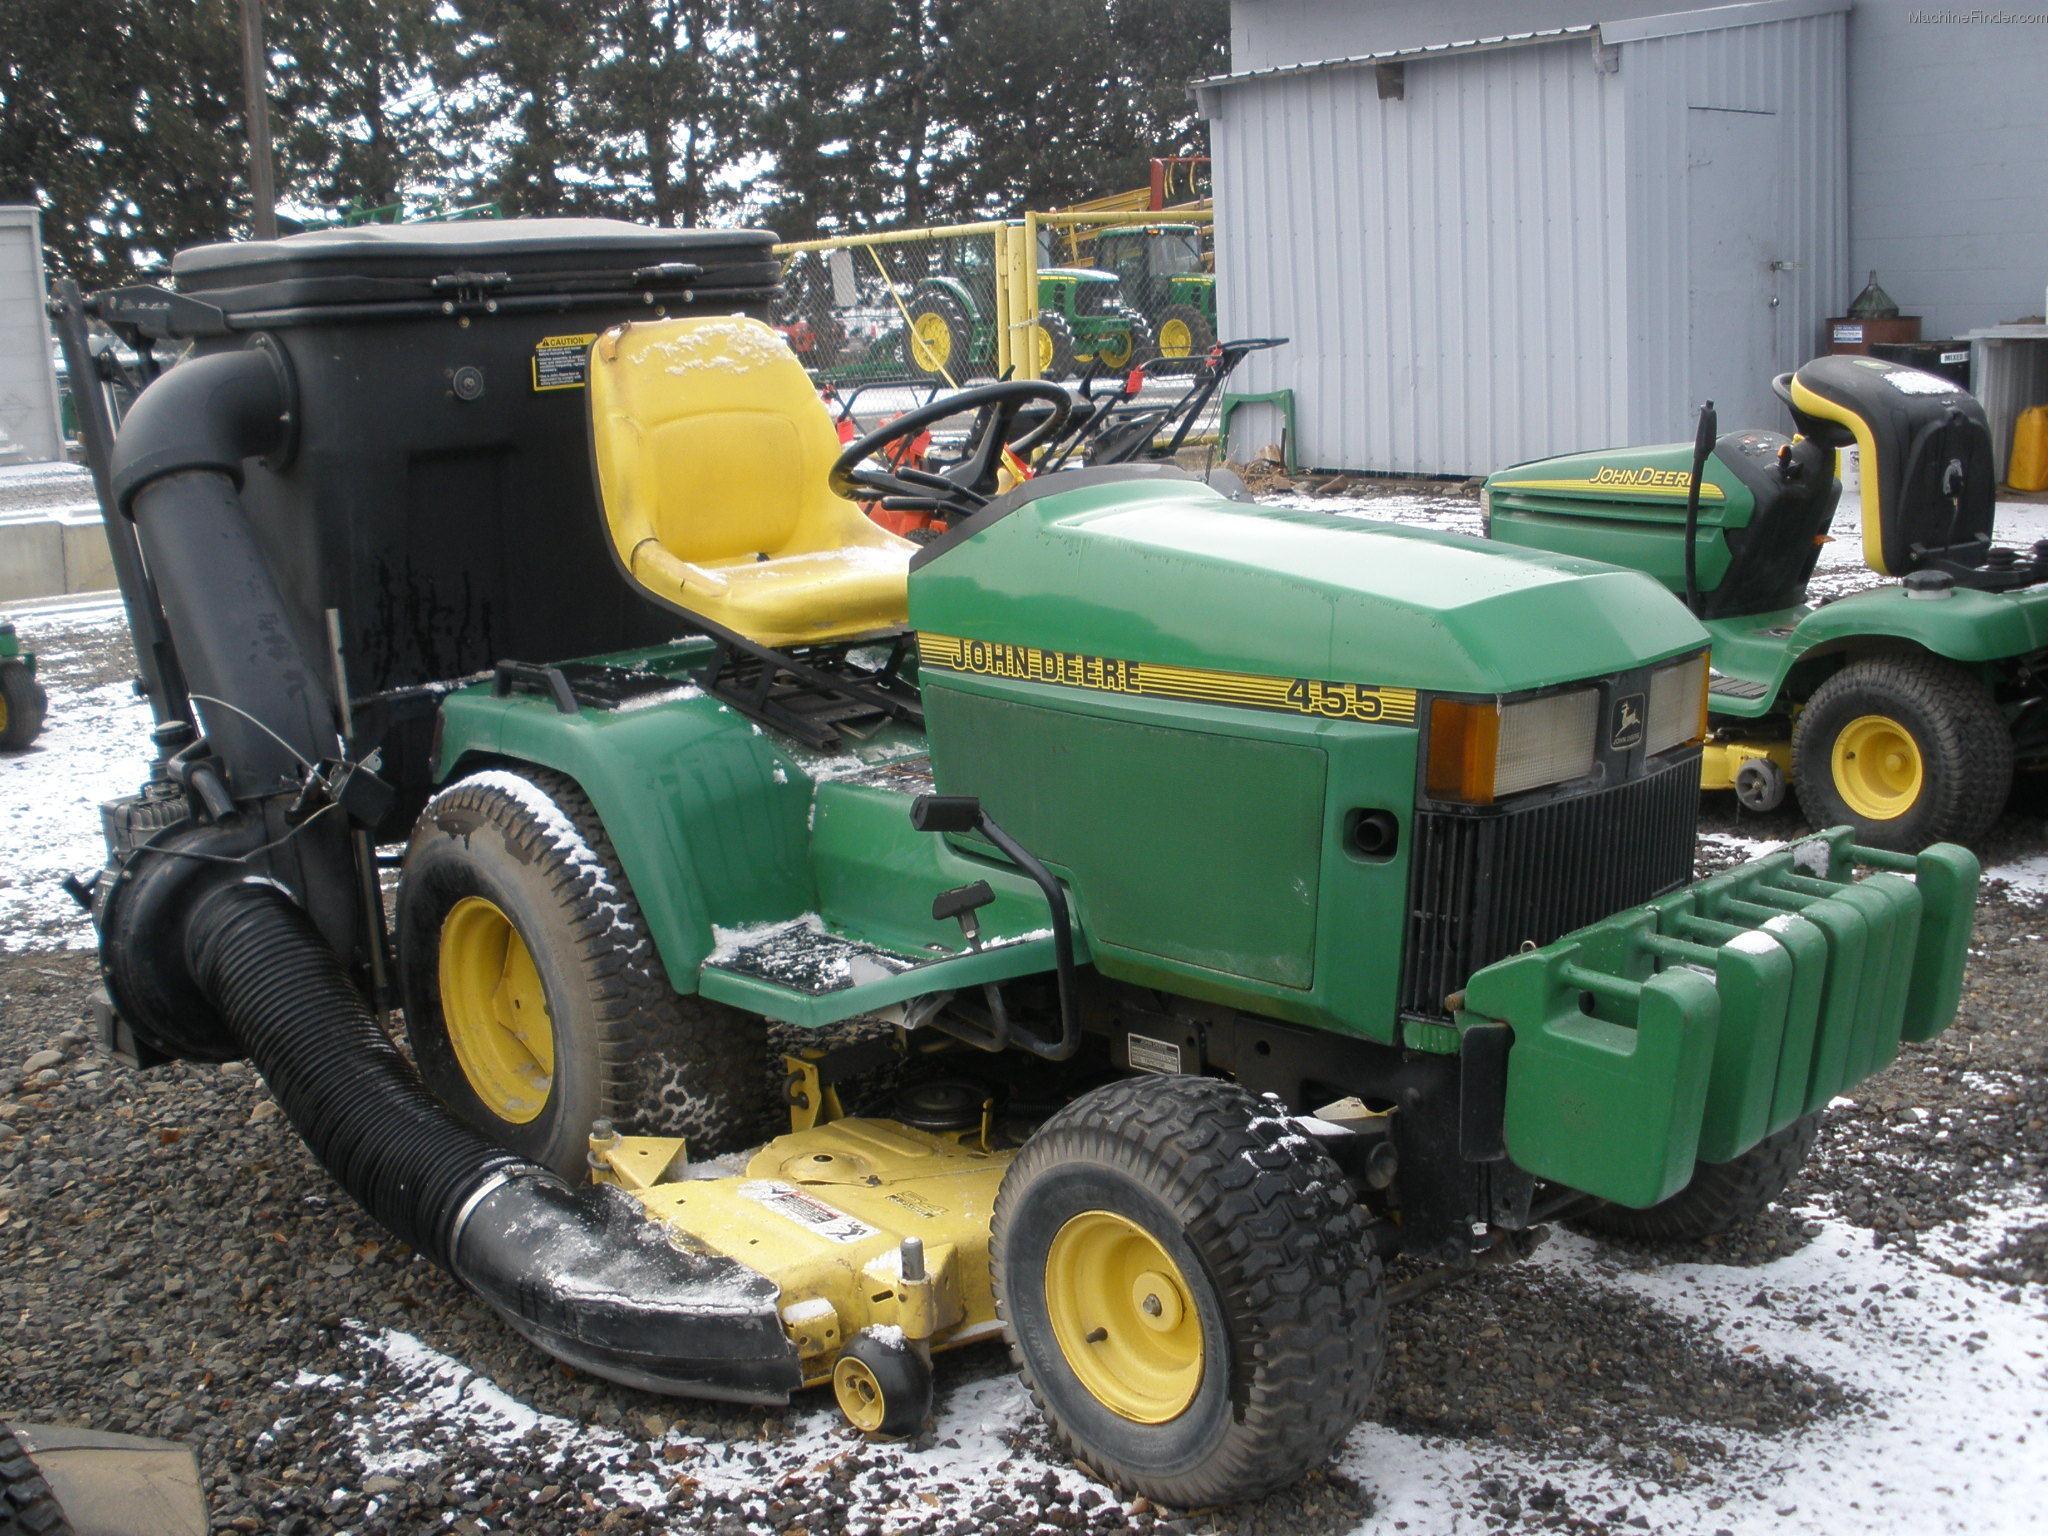 John Deere 455 Mower Parts : John deere lawn tractor parts car interior design